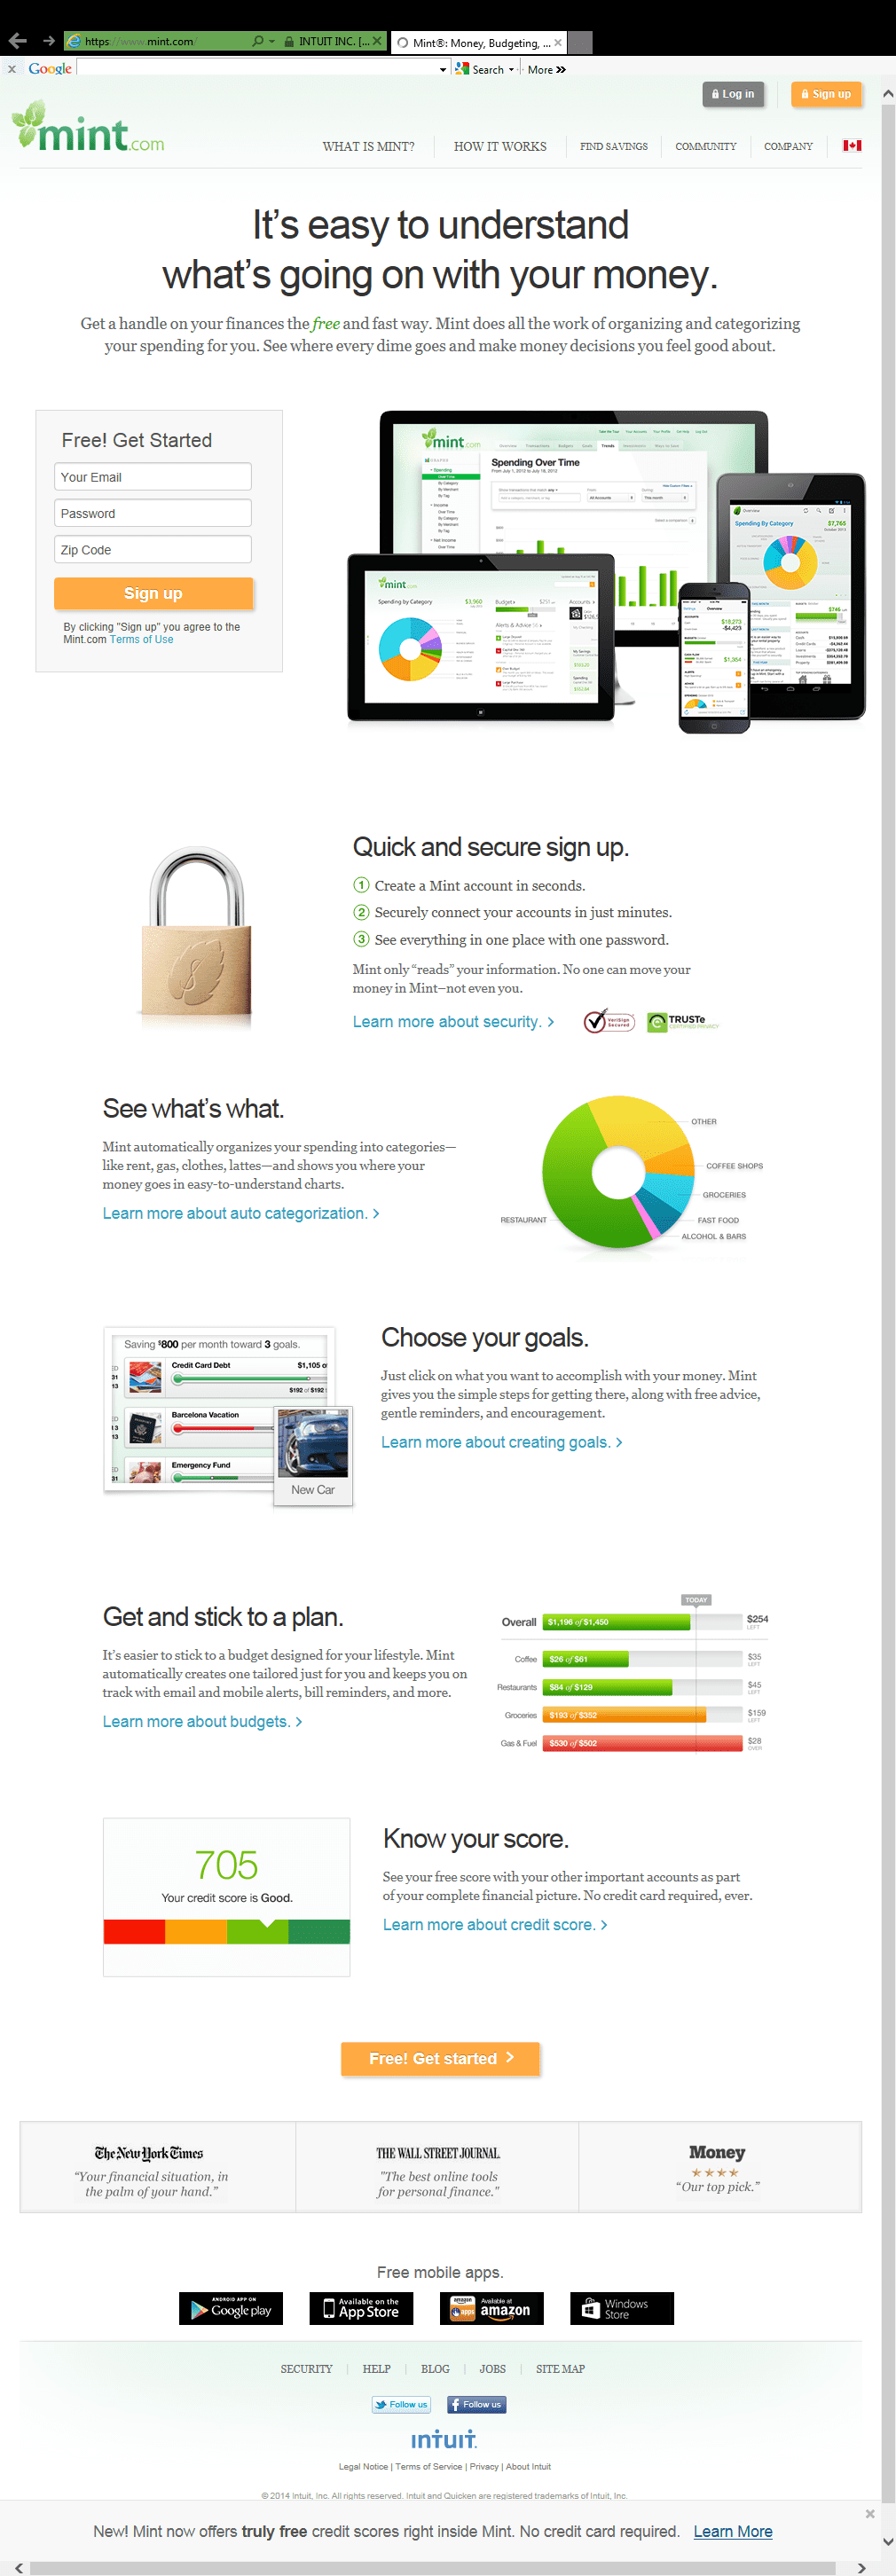 Mint.com-Before-Eye-Tracking